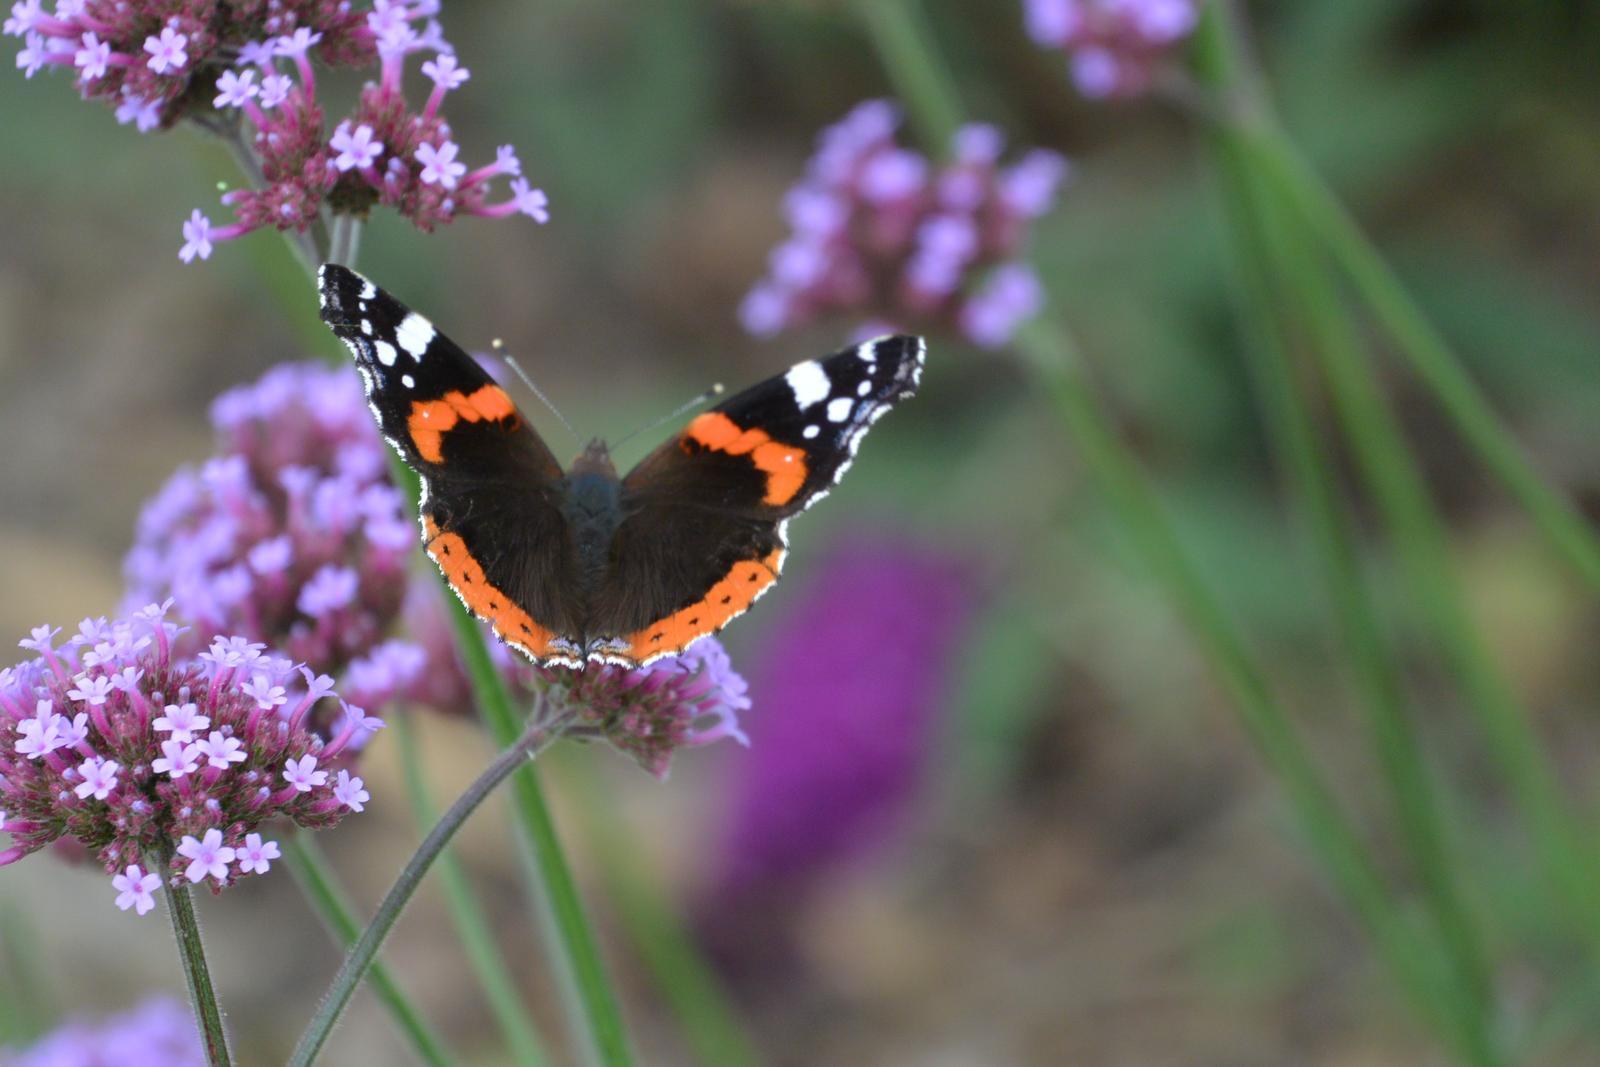 Motýlí zahrada 2019-2020 - Obrázek č. 59